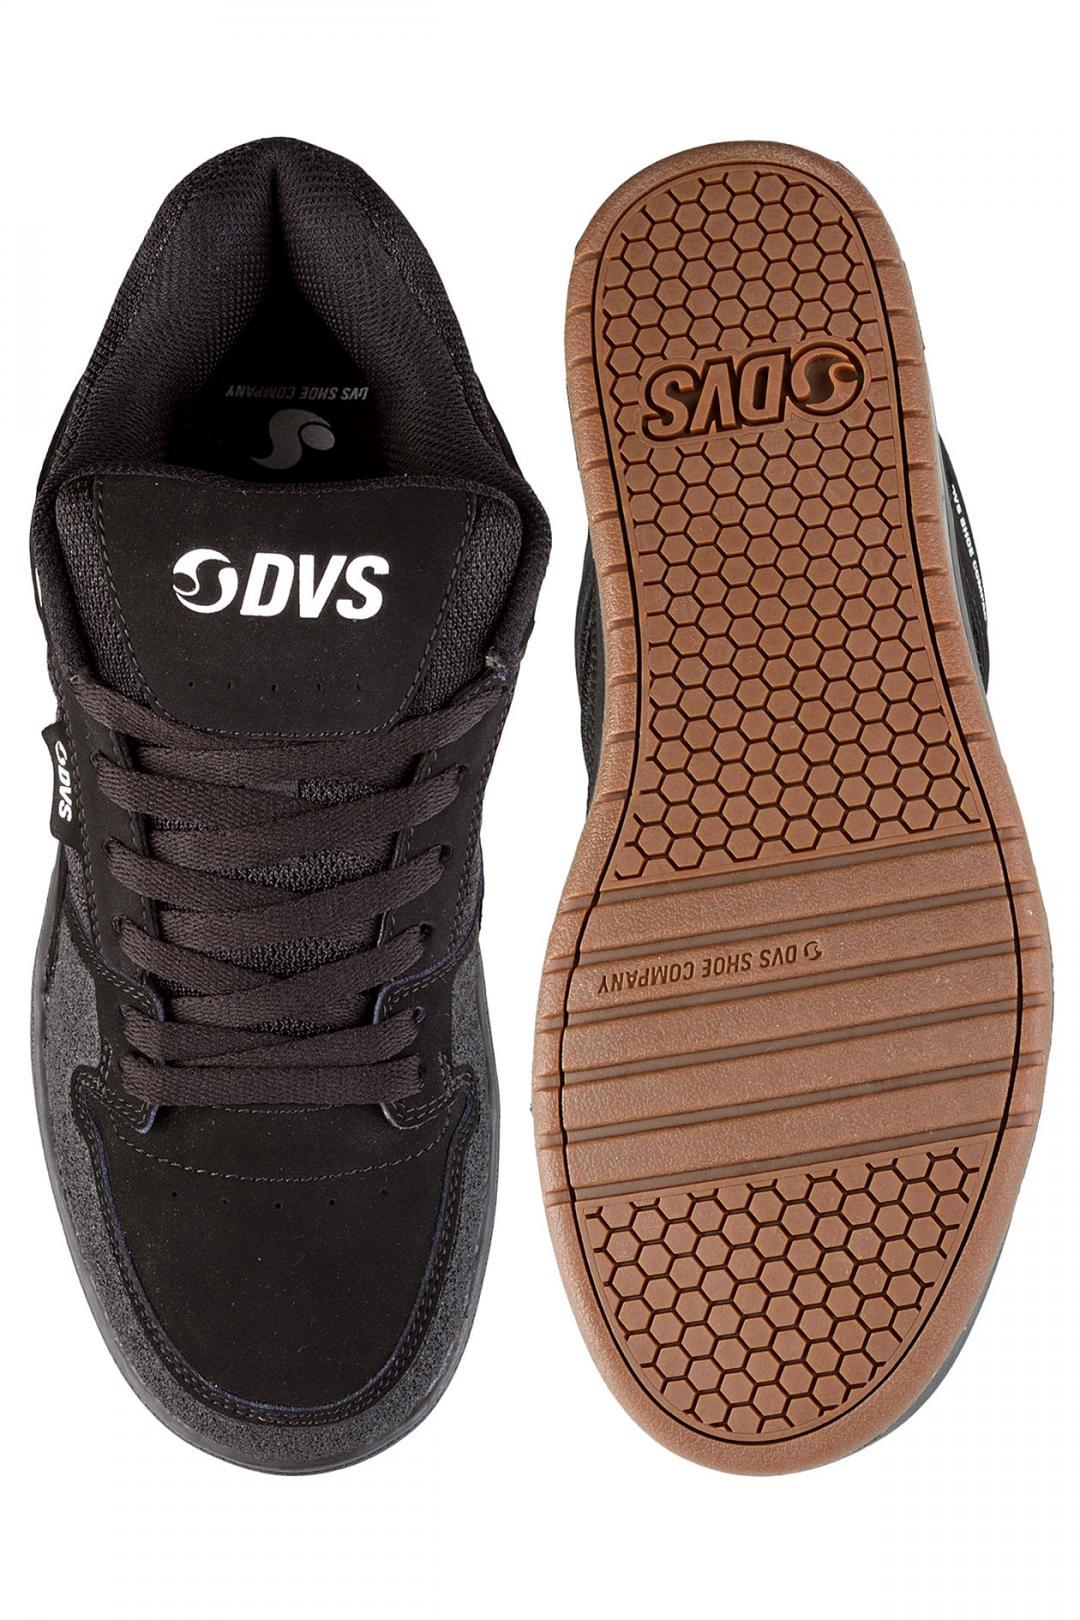 Uomo DVS Portal Nubuck black | Sneakers low top